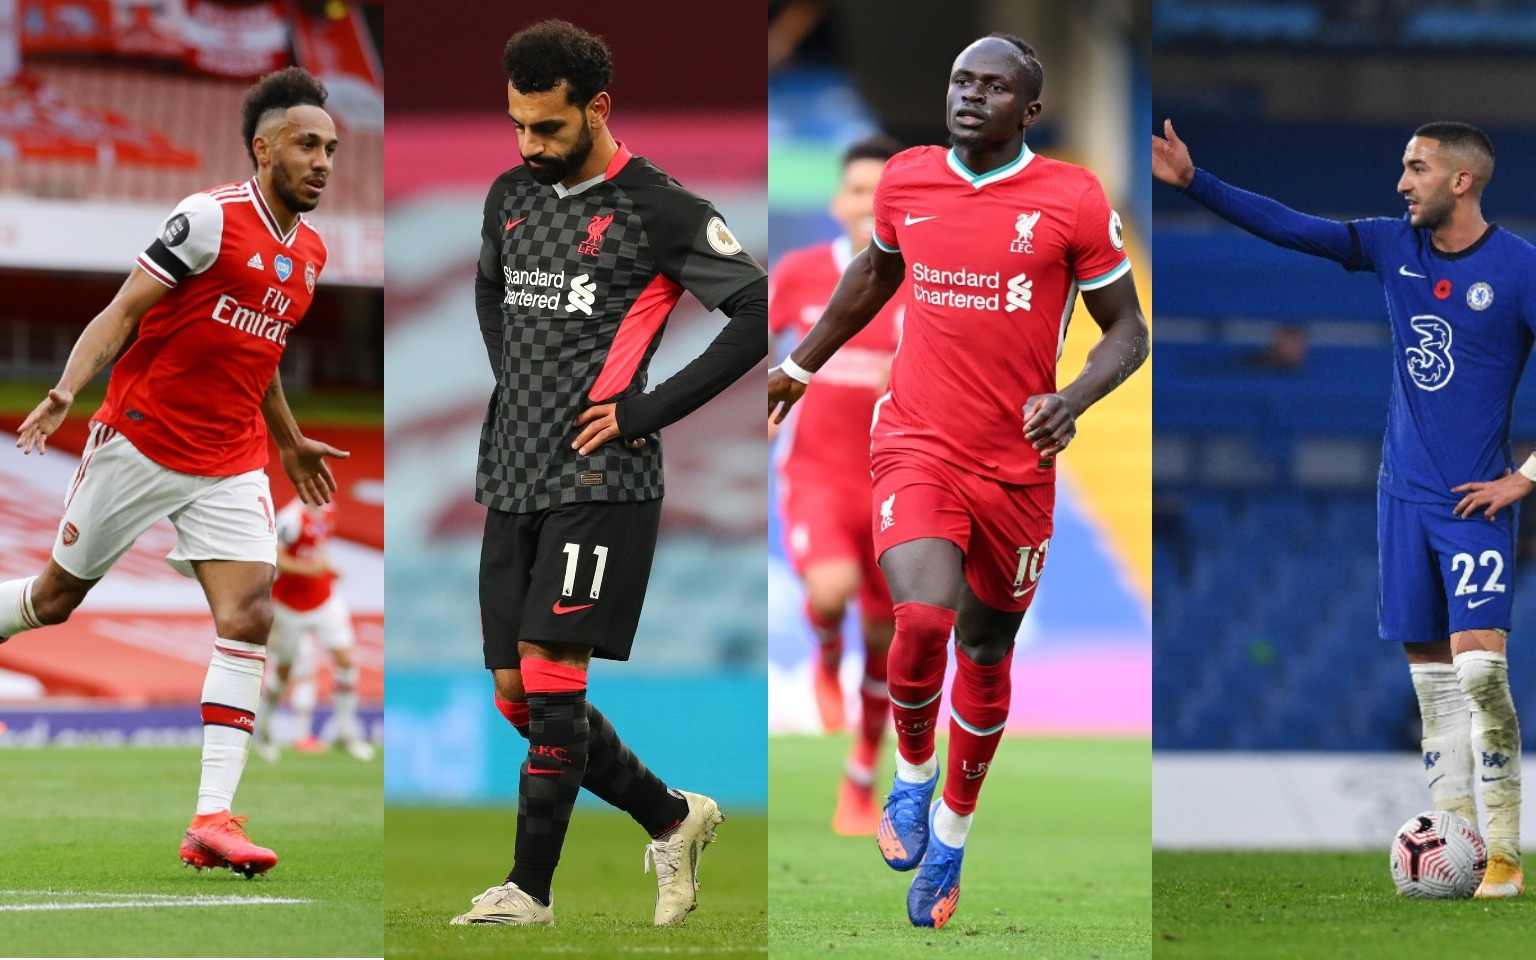 Mohamed Salah II, Africa, among the top 100 players